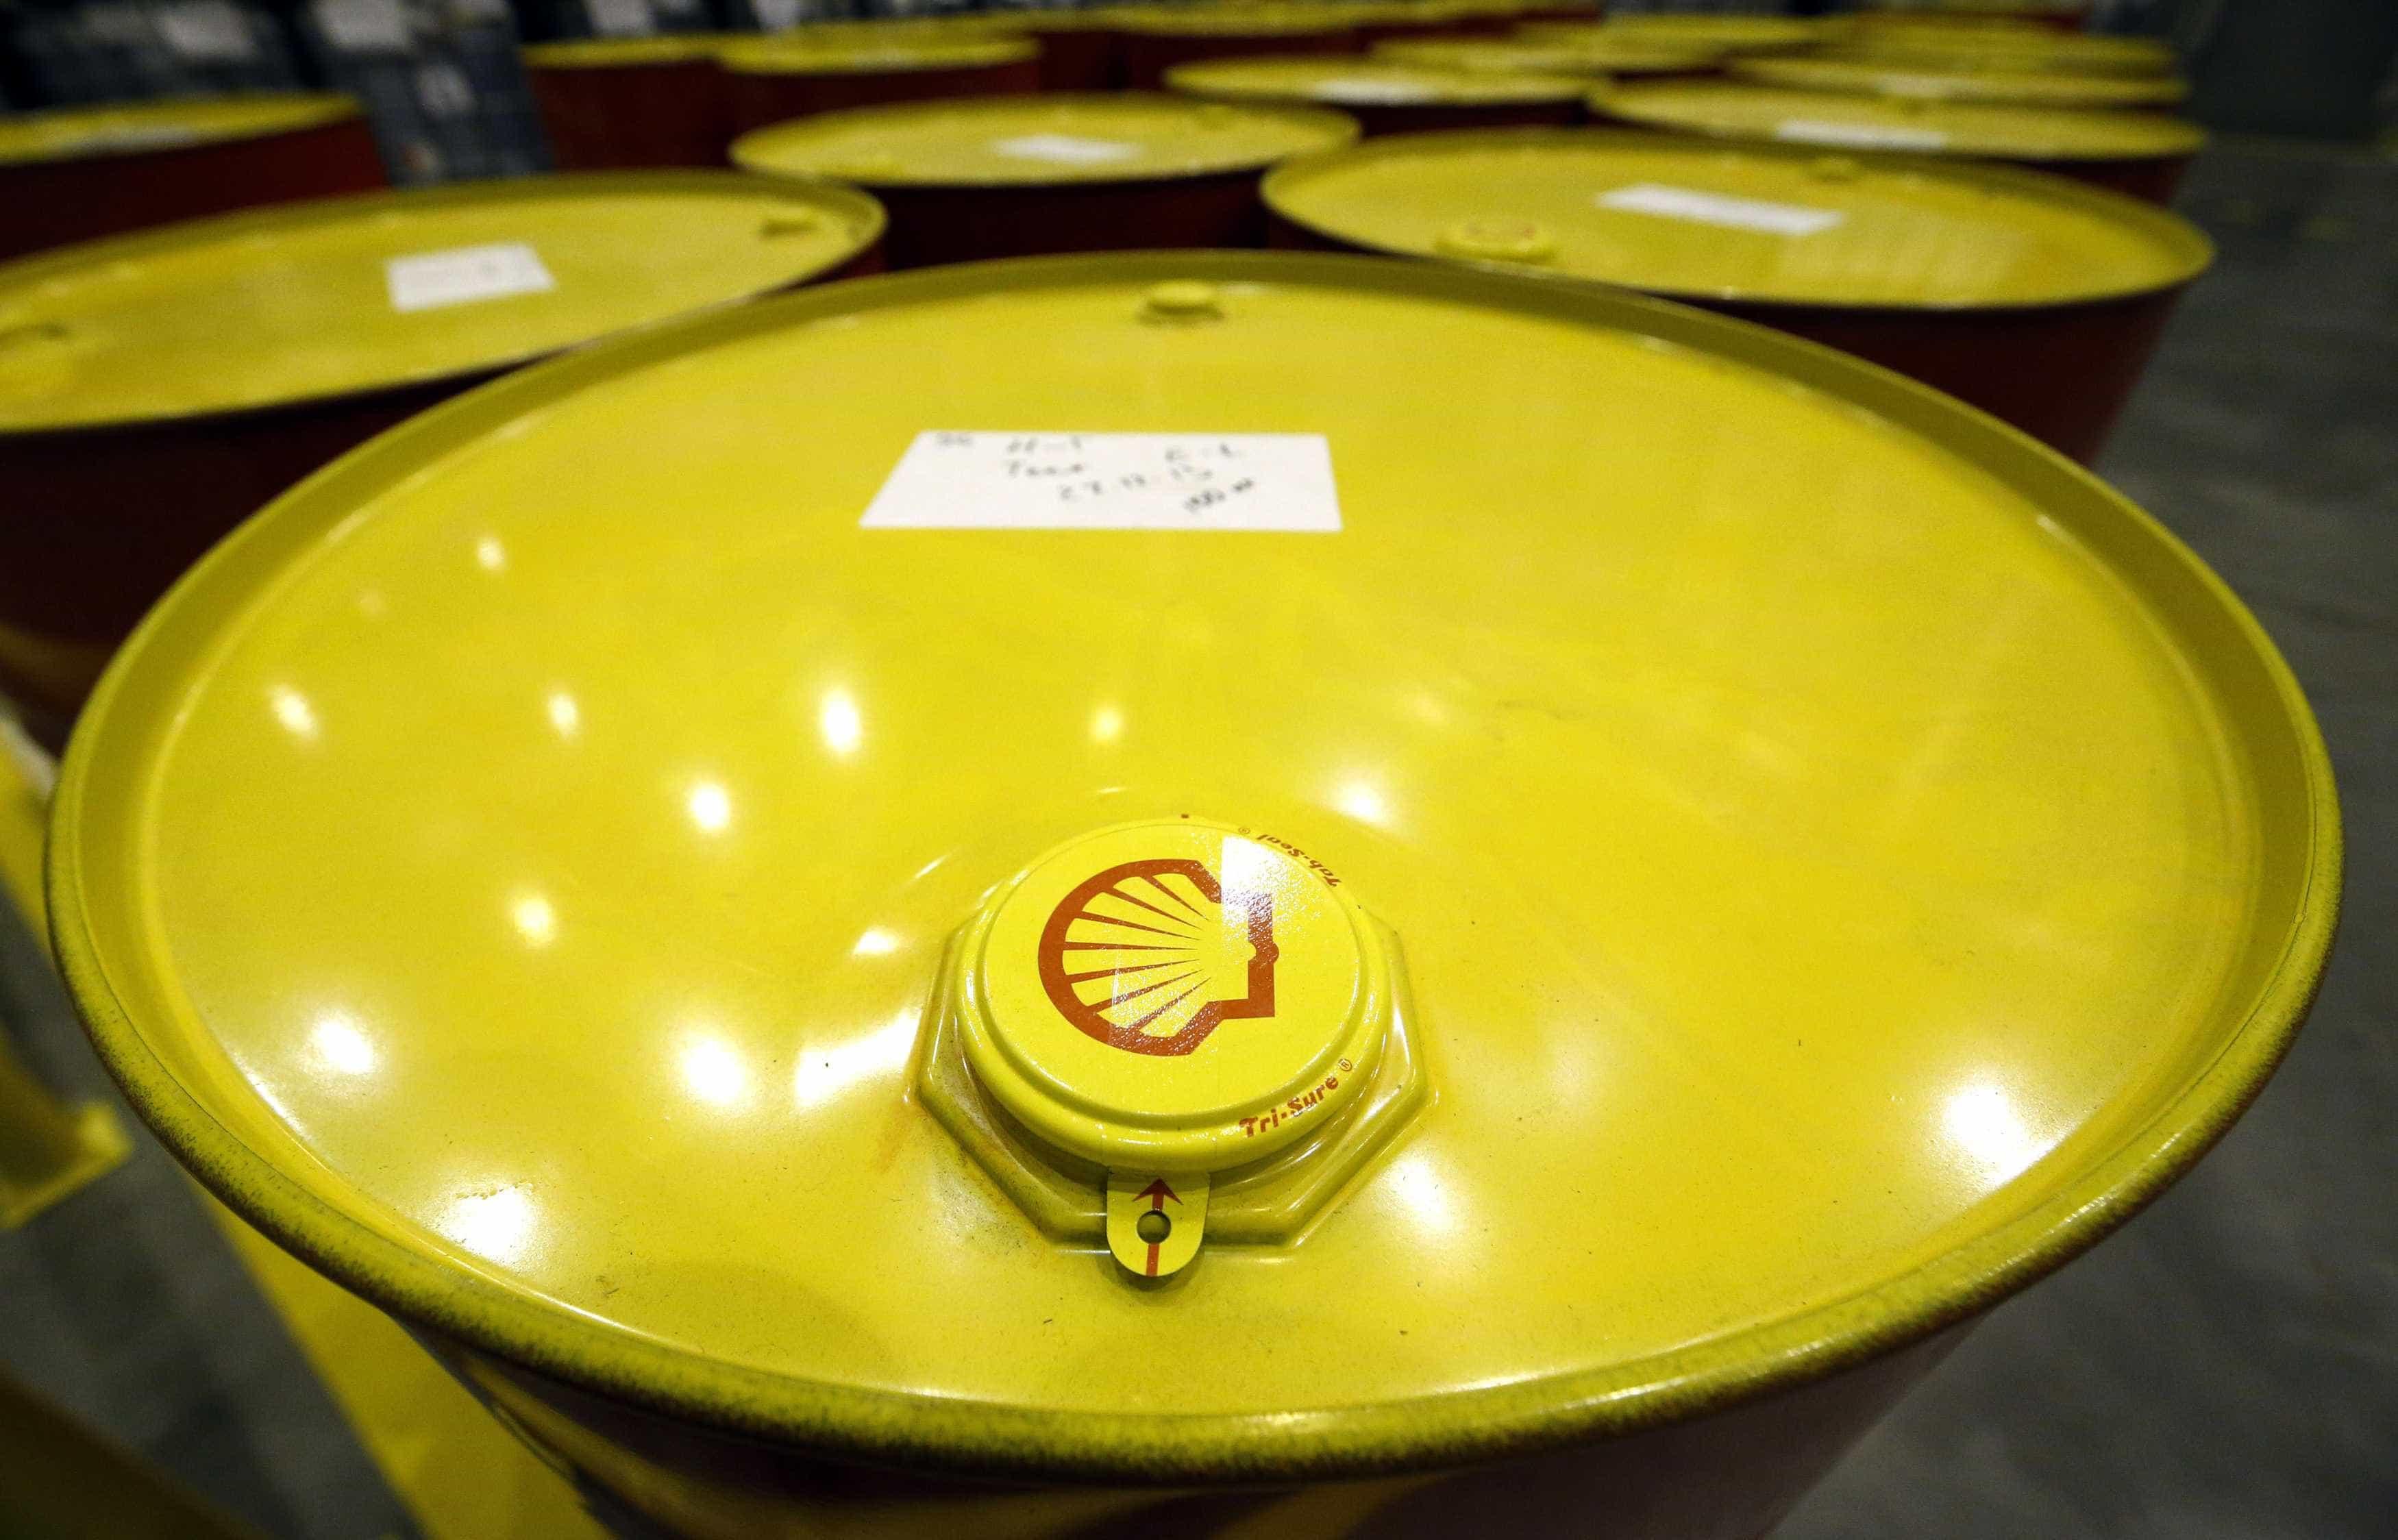 Arábia Saudita vai reduzir a produção em 500 mil barris